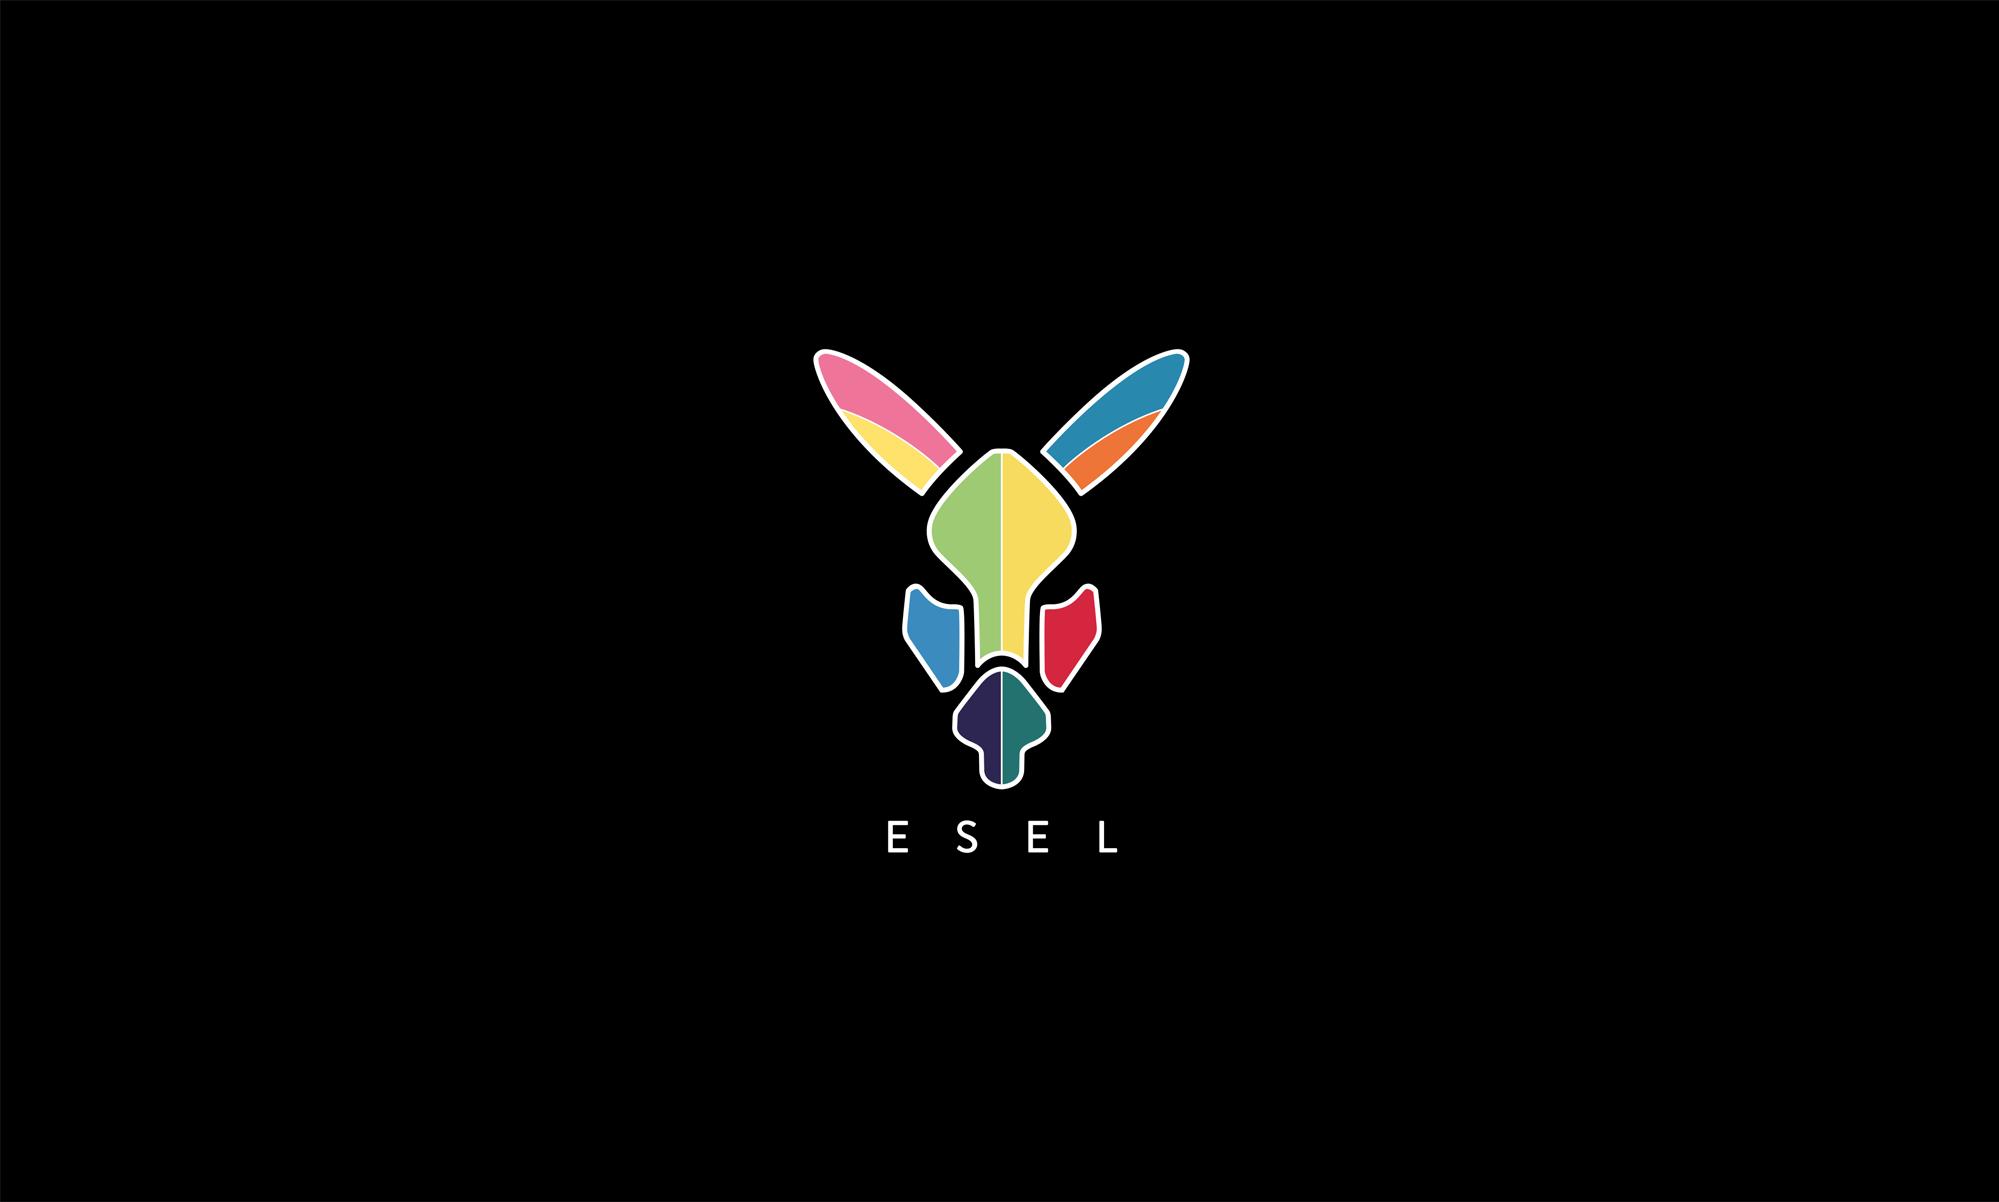 nfb_esel_case_01